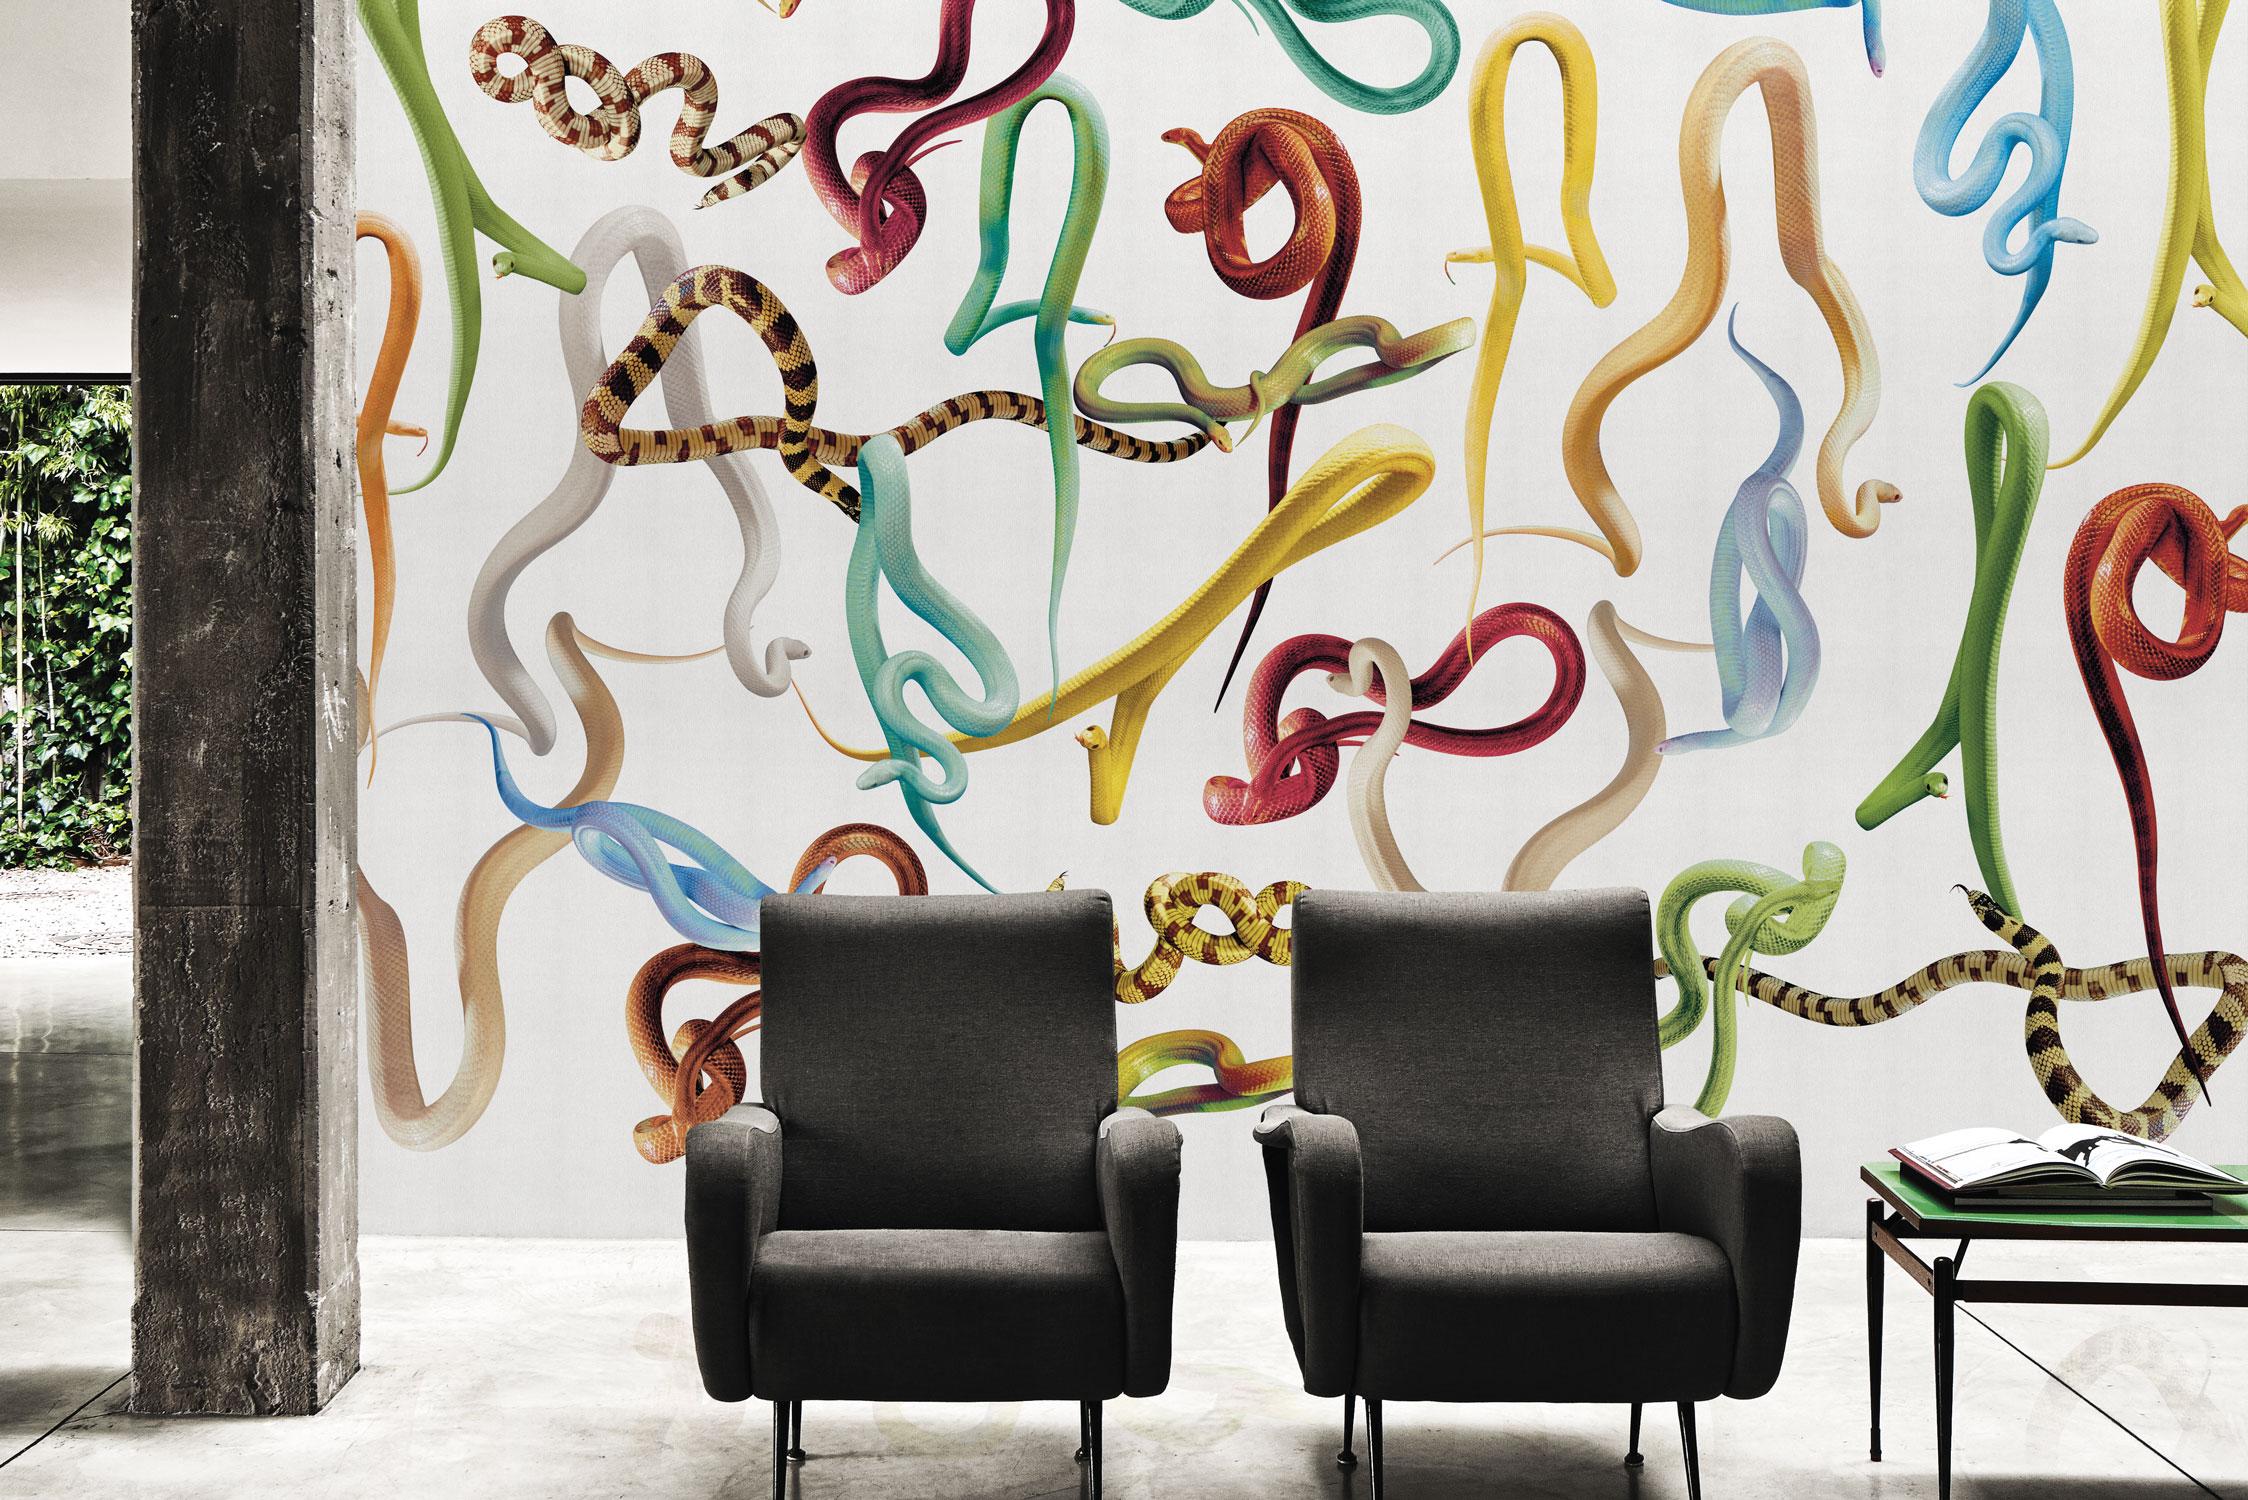 londonart-carta-da-parati-wallpaper-edilmea-matera-arredobagno-bagno-interni